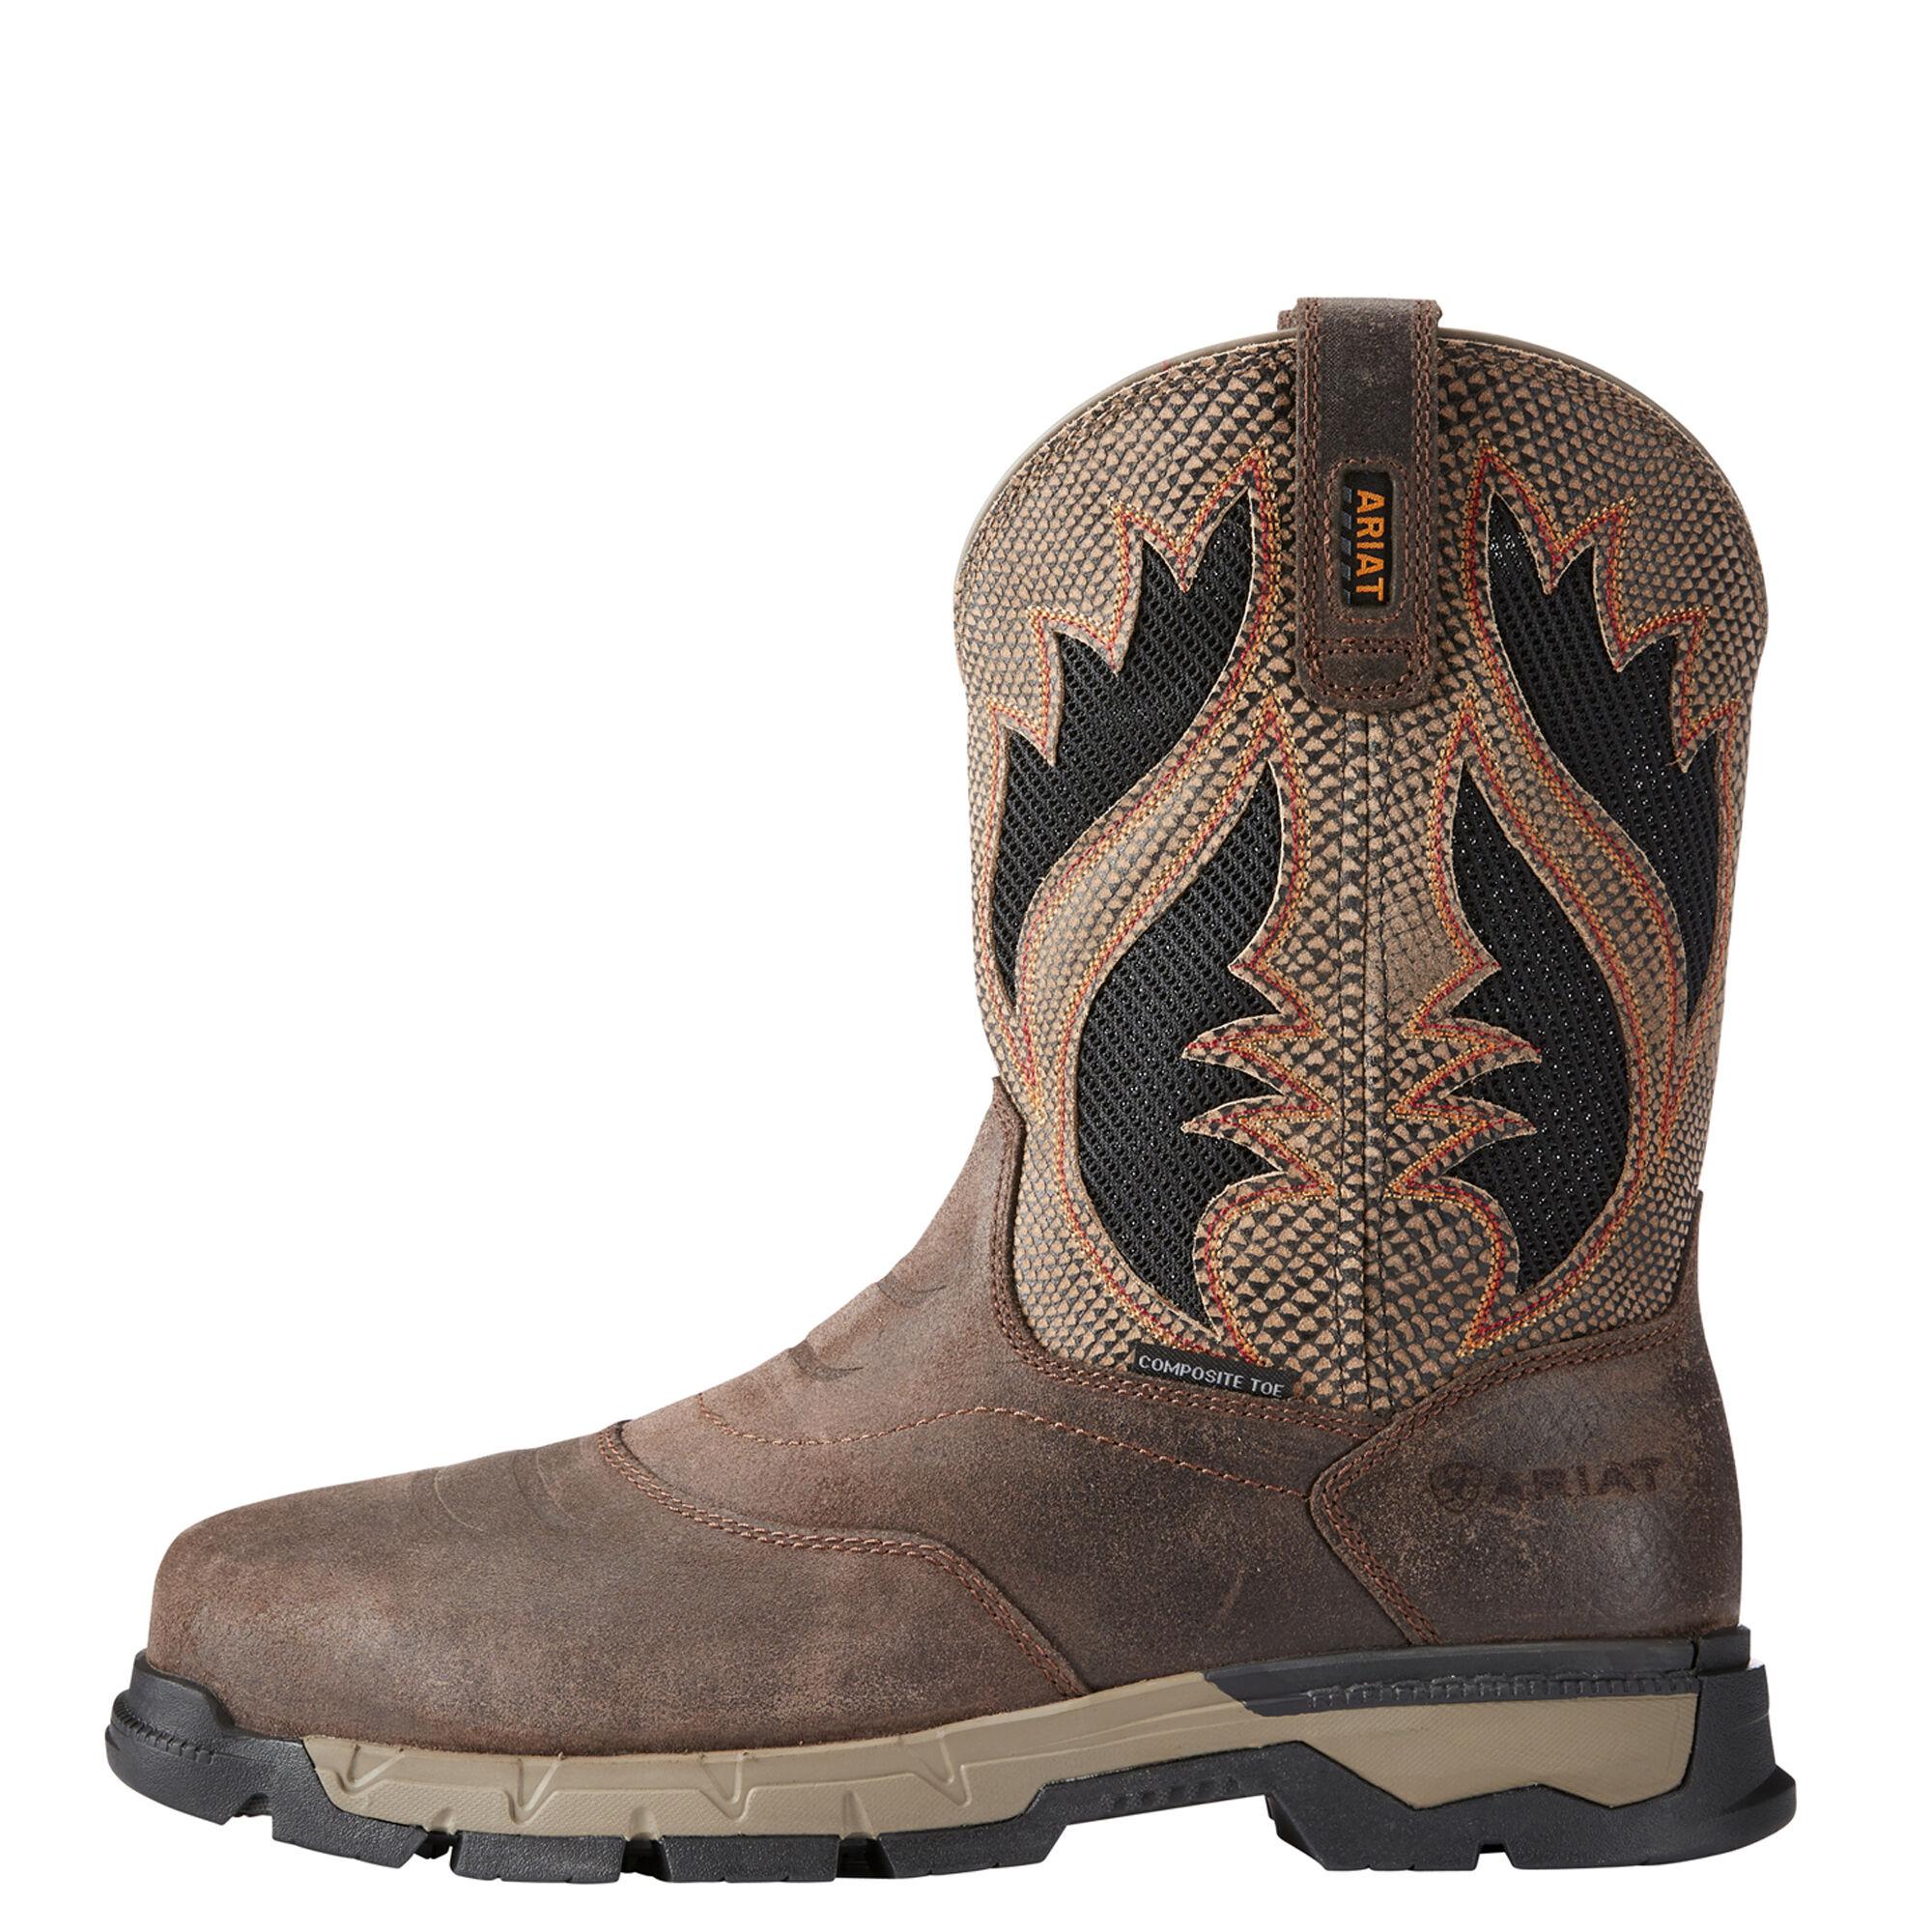 Men's Ariat Rebar Western VentTEK Composite Toe Work Boot, Size: 11.5 2E, Chocolate Brown Leather